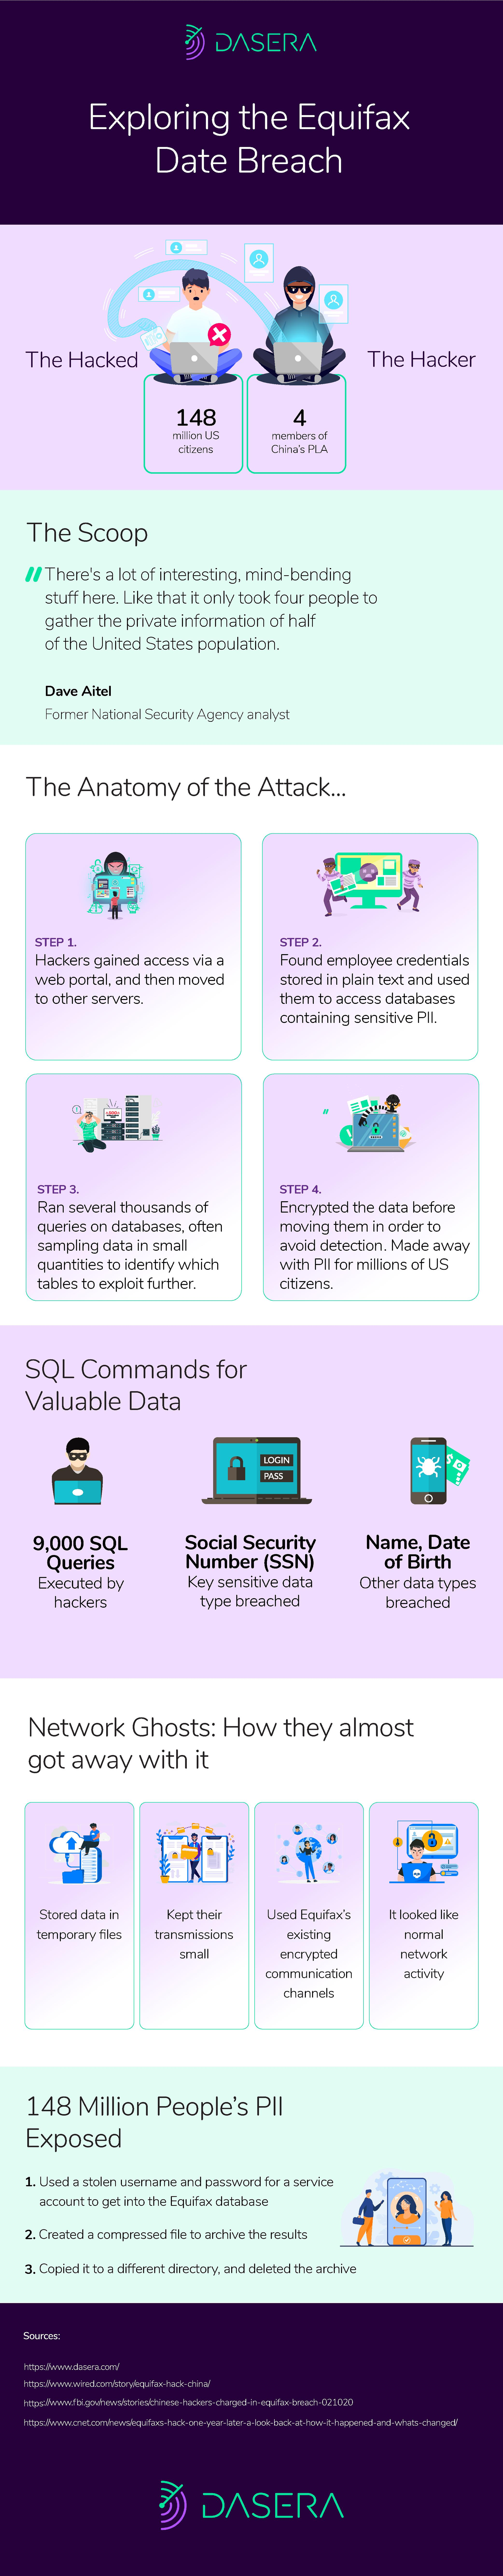 Equifax-data breach infographic-01 (2)